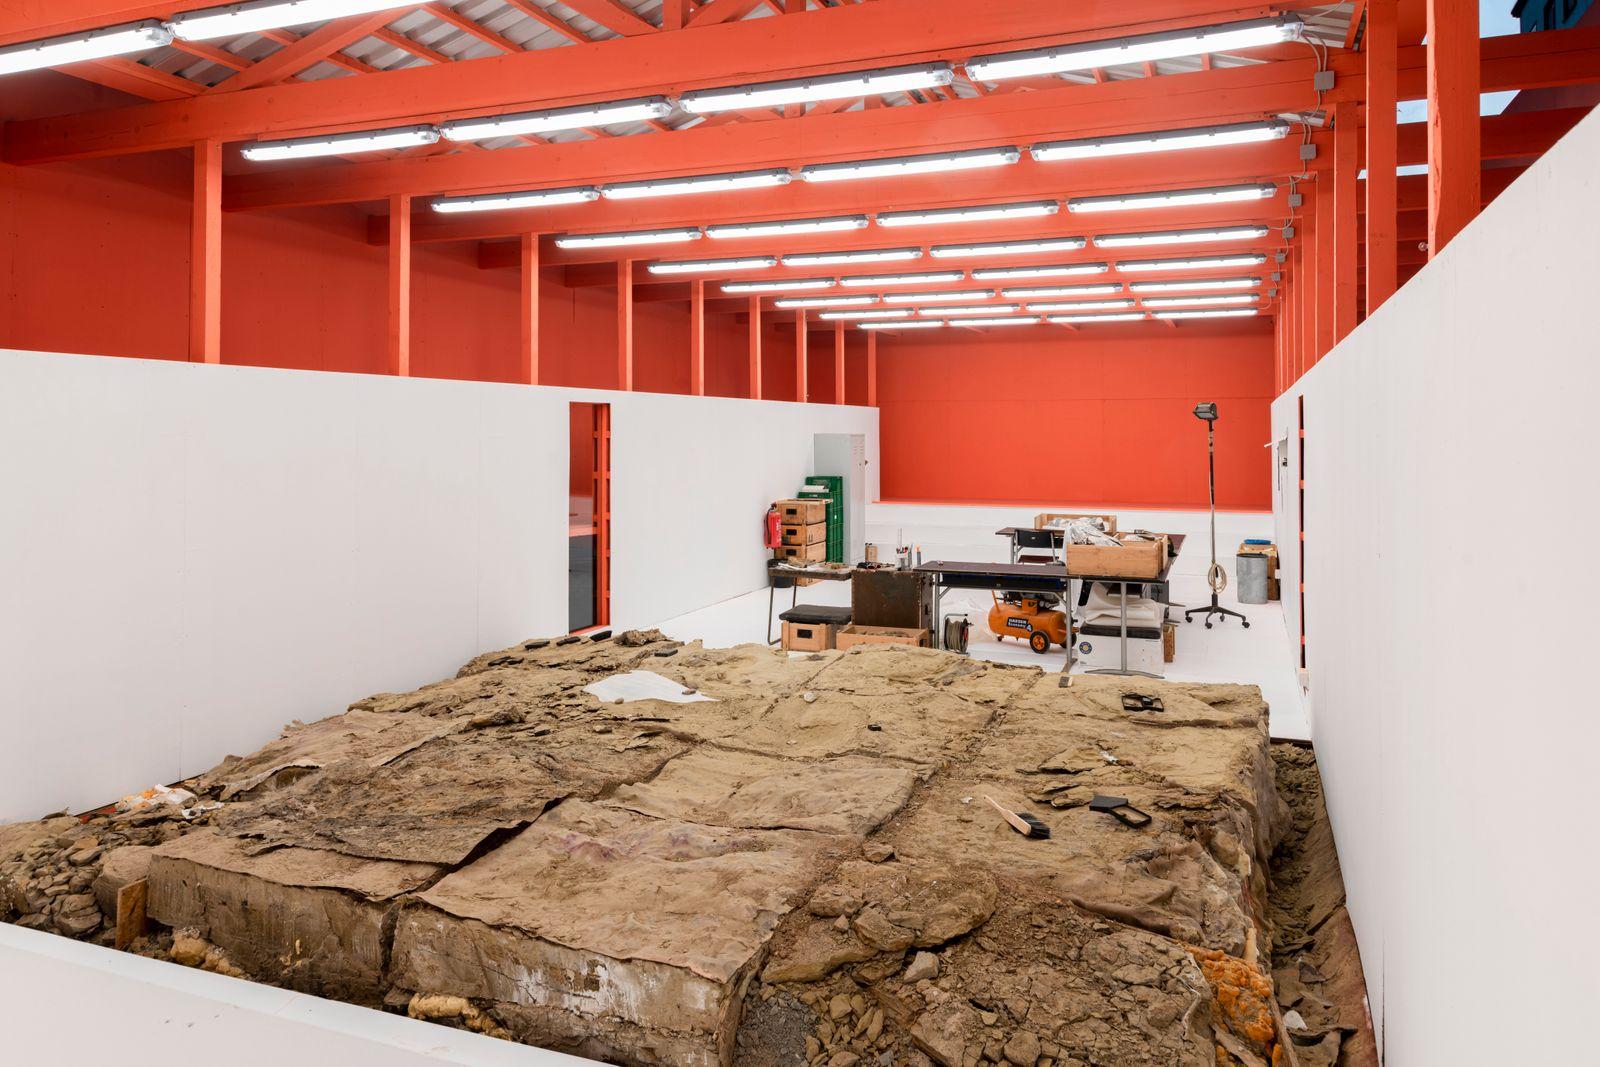 Edmonds Urzeitreich_Pavillon